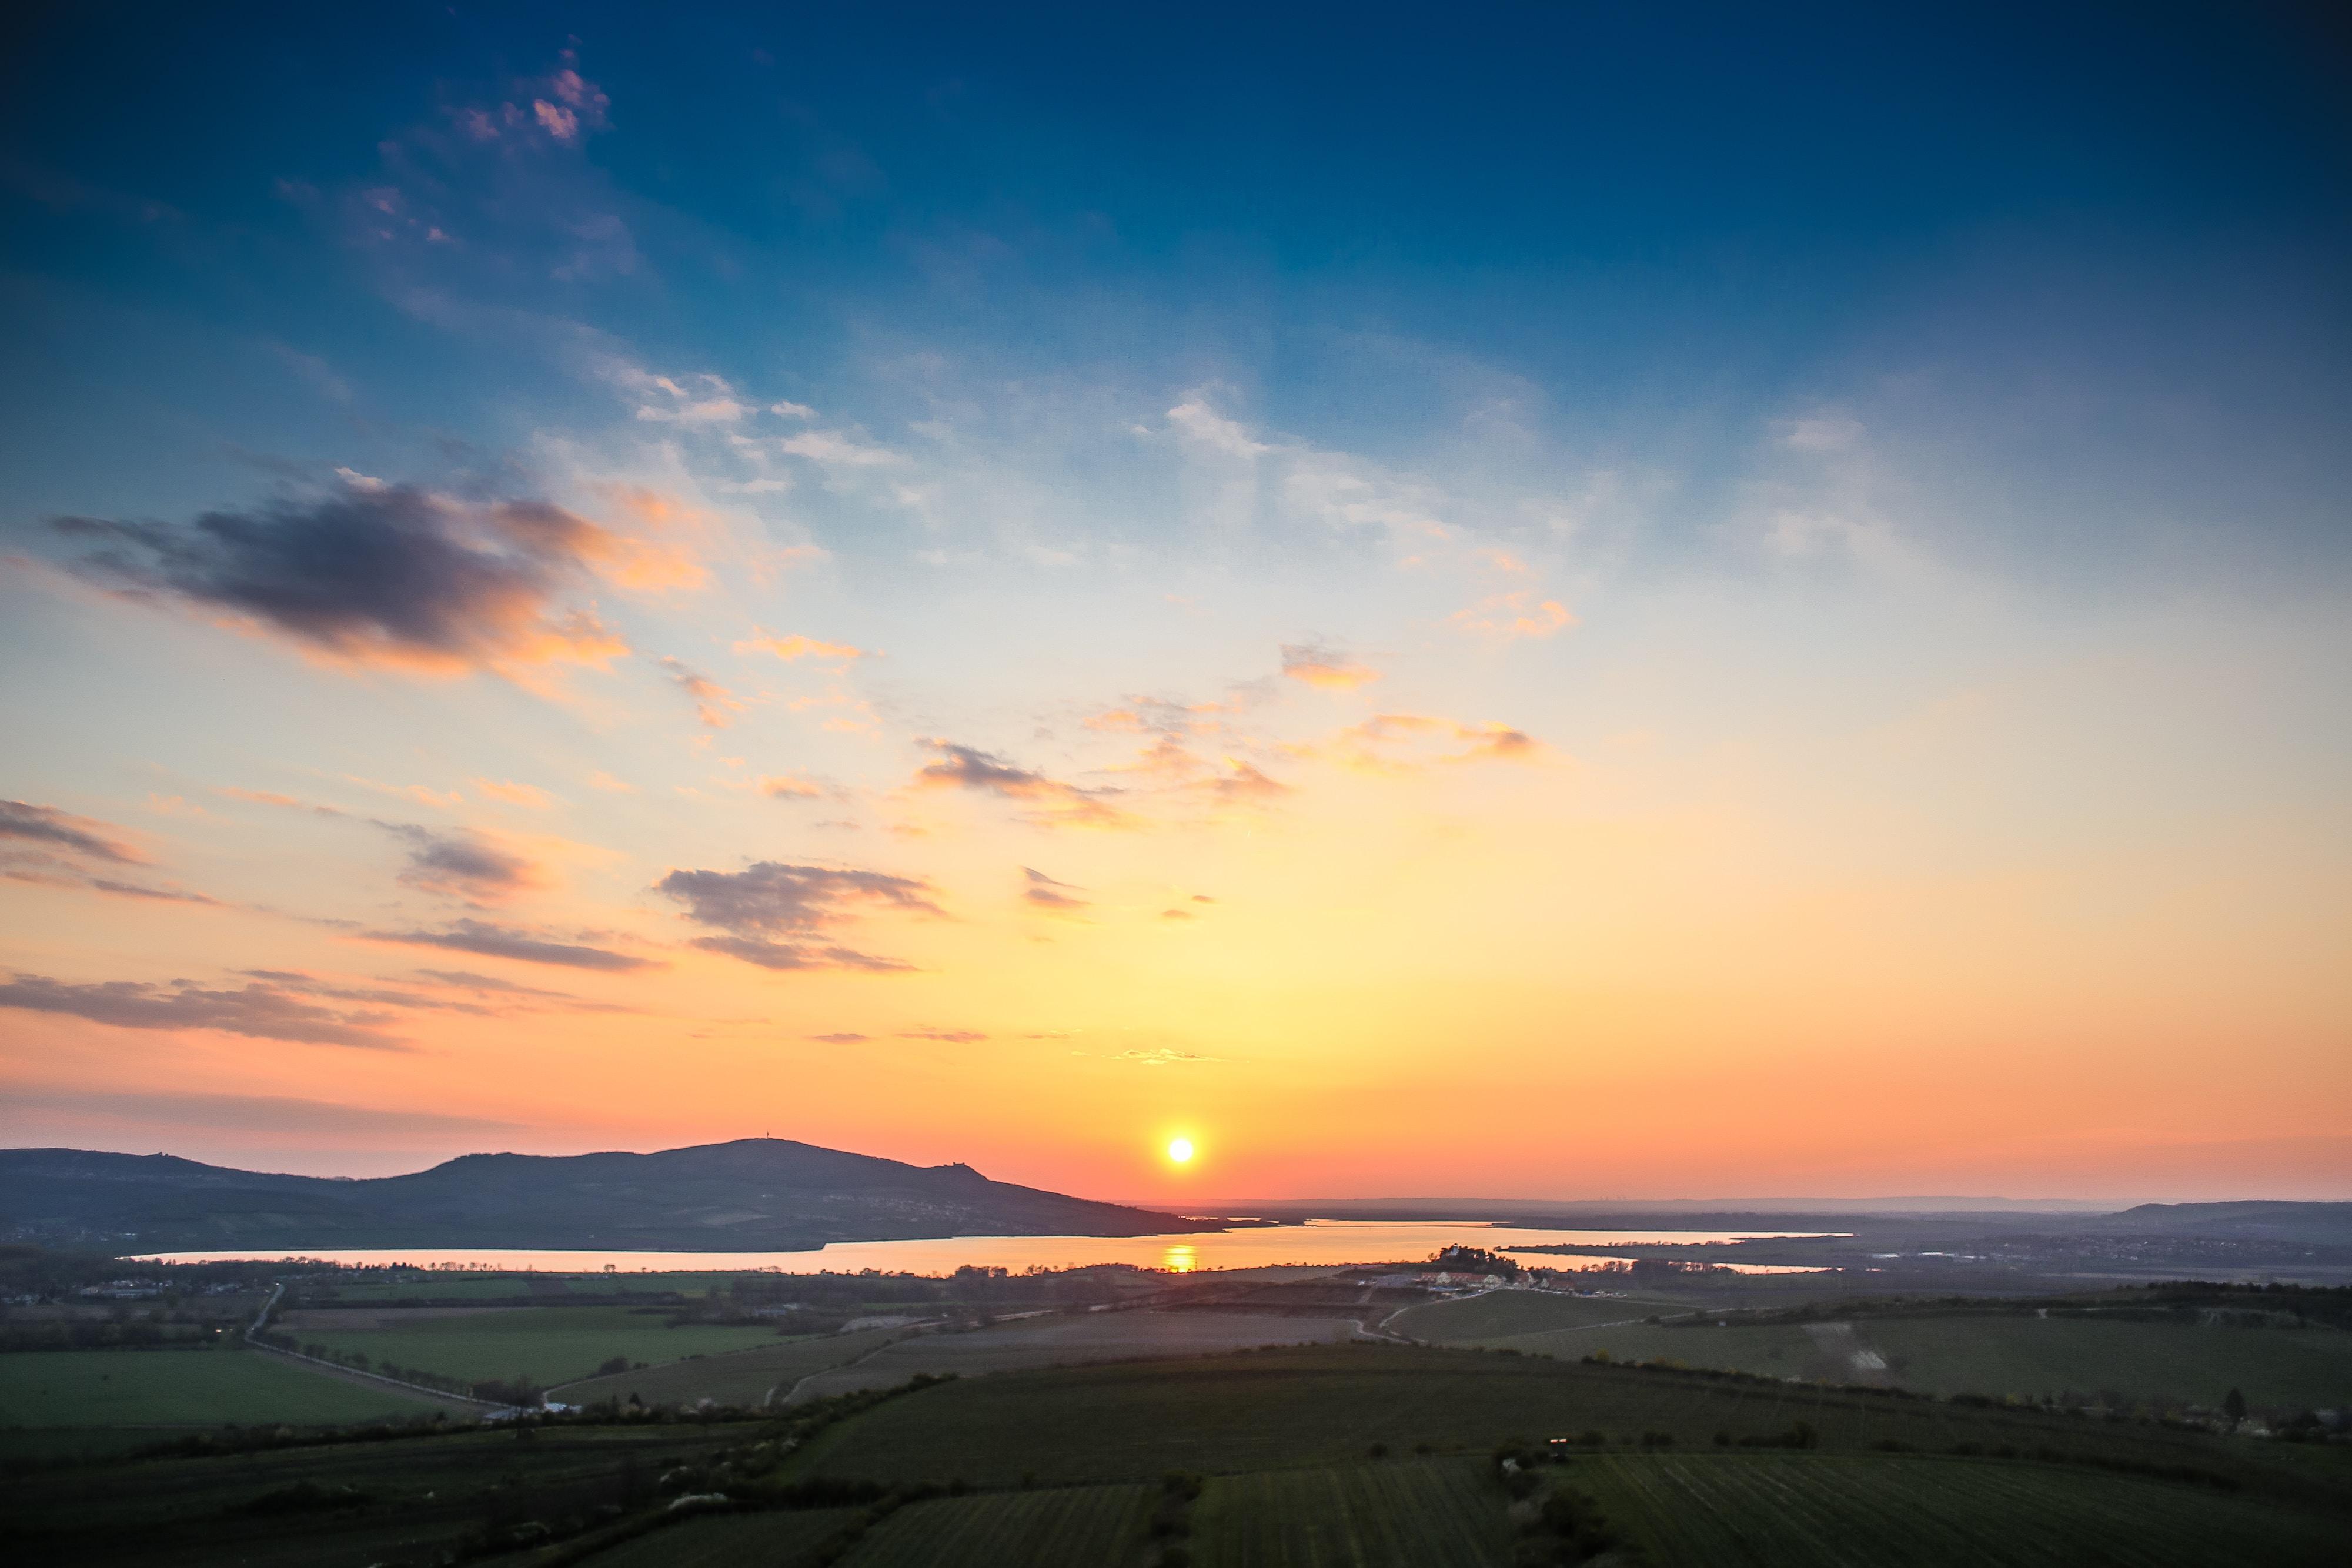 bird's-eye view photo of landscape field during golden hour